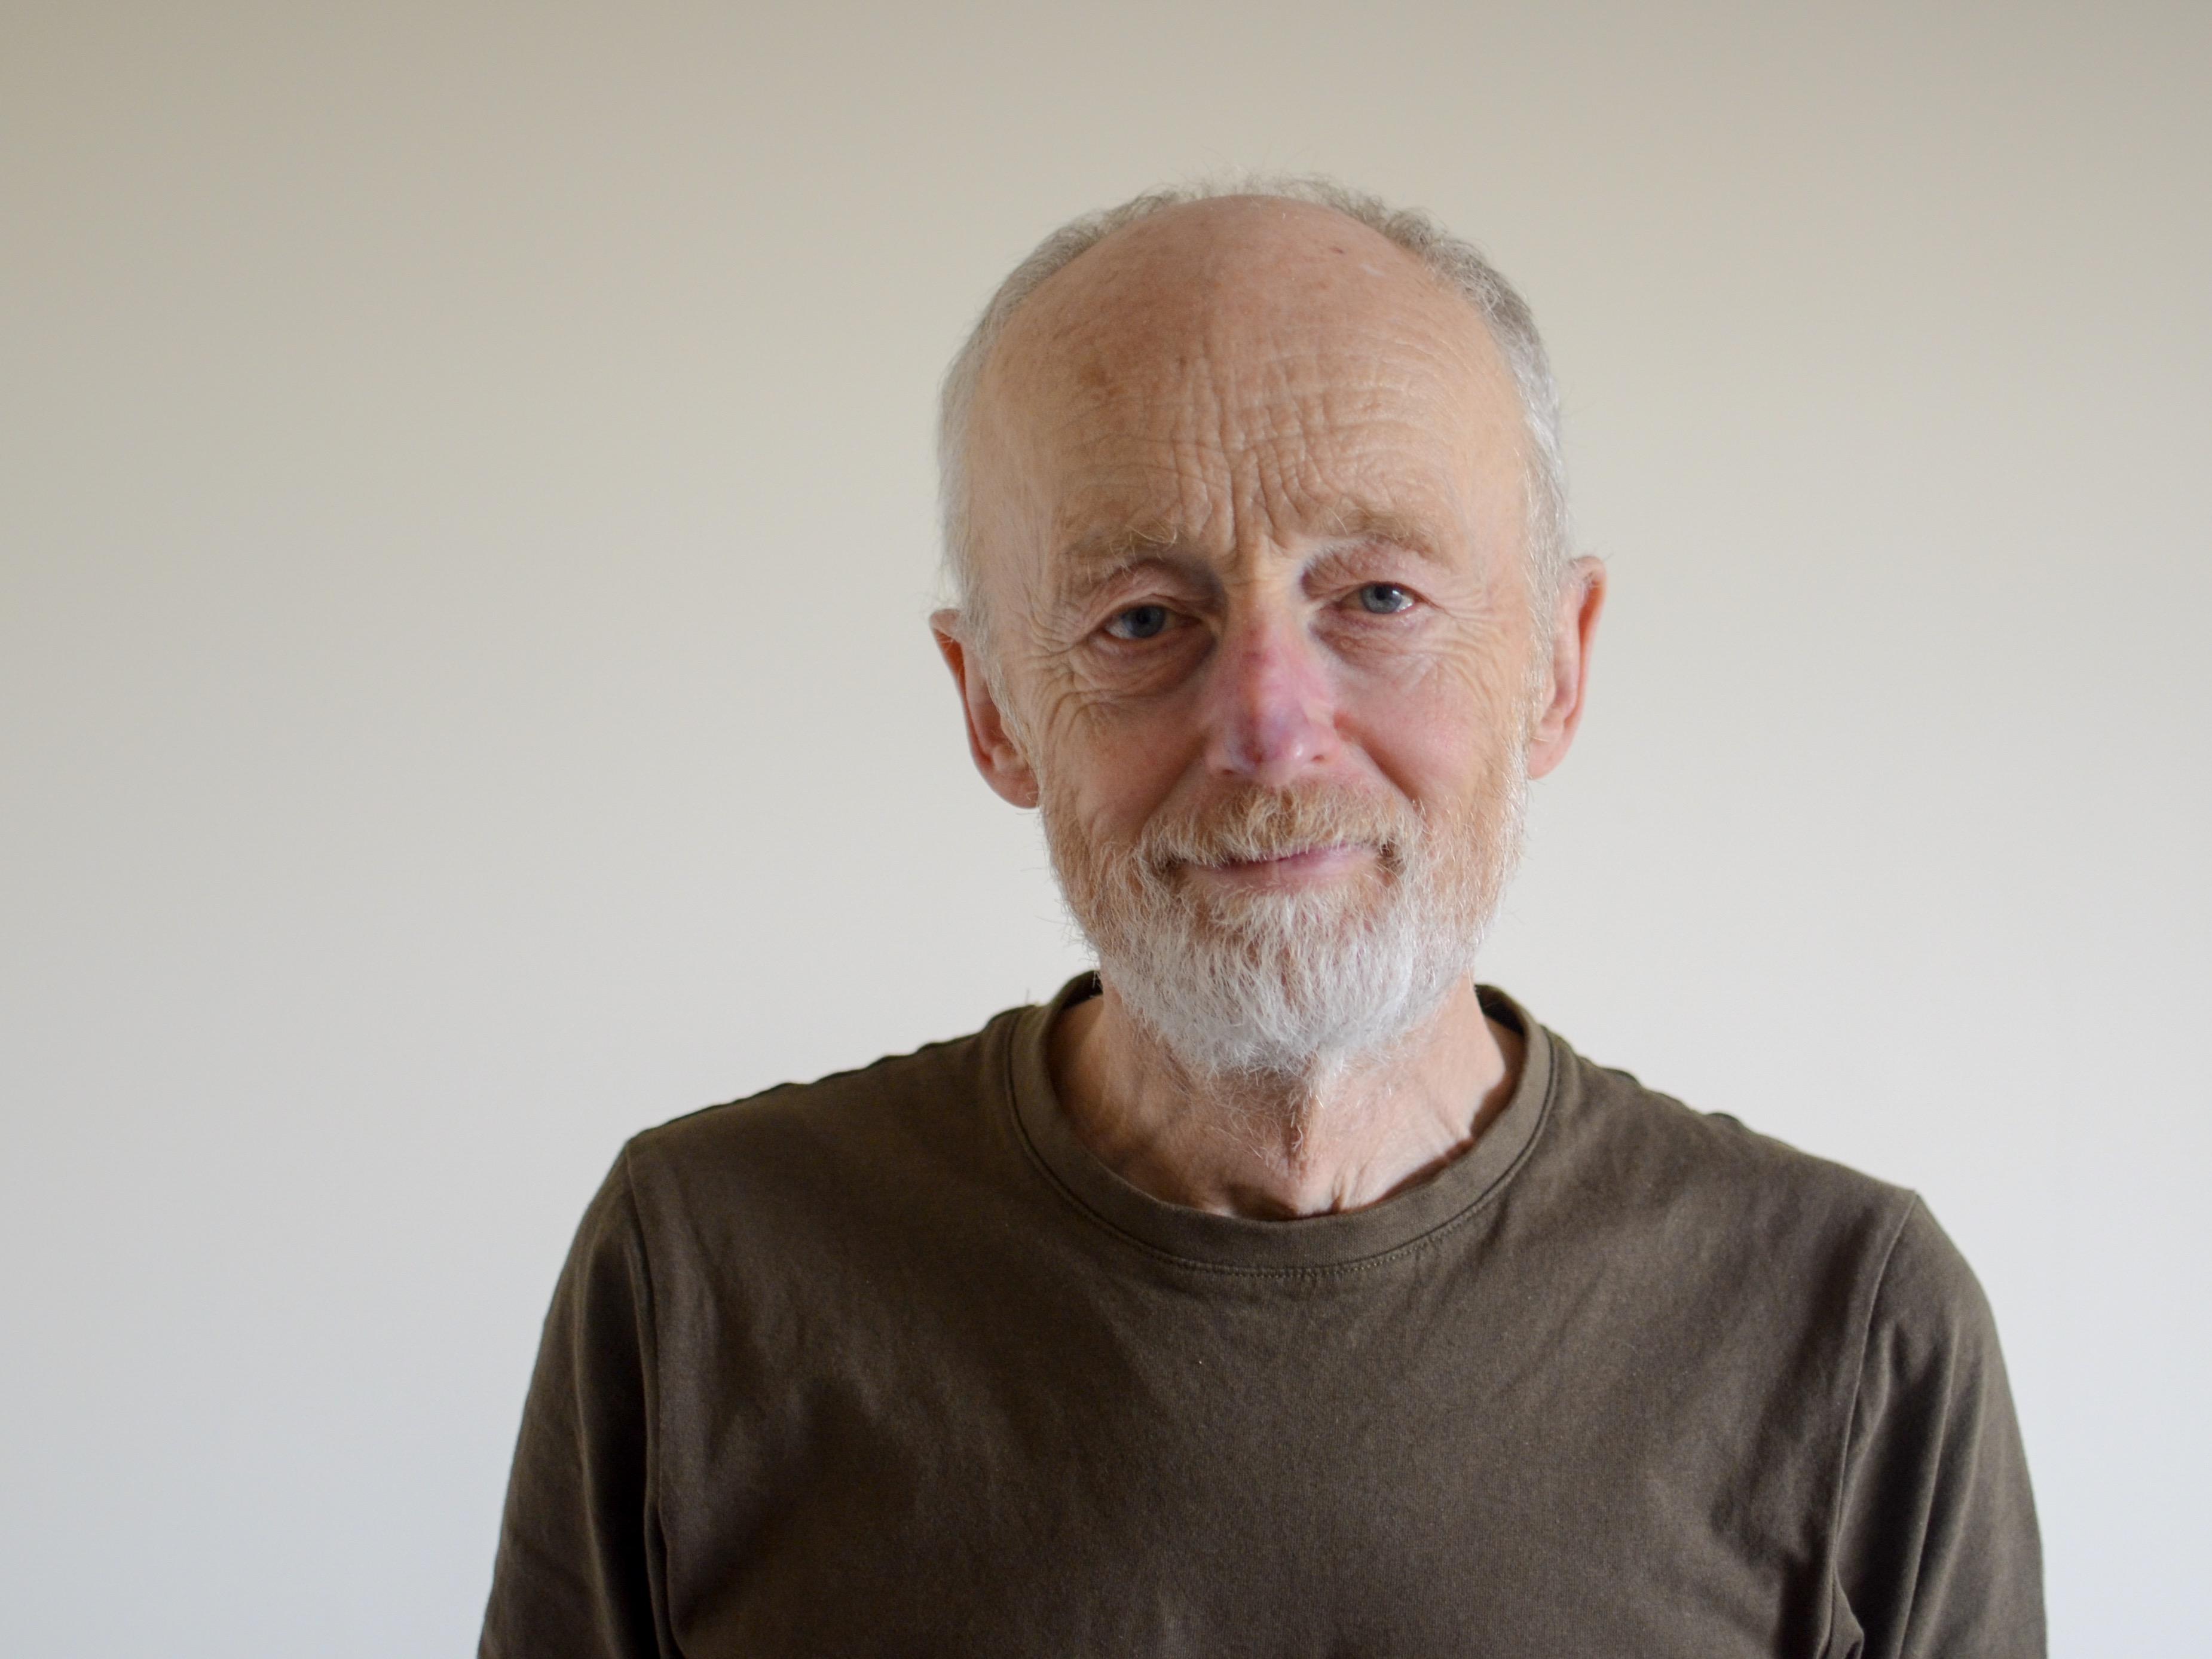 Image of Liskeard Town Councillor Ian Barlow